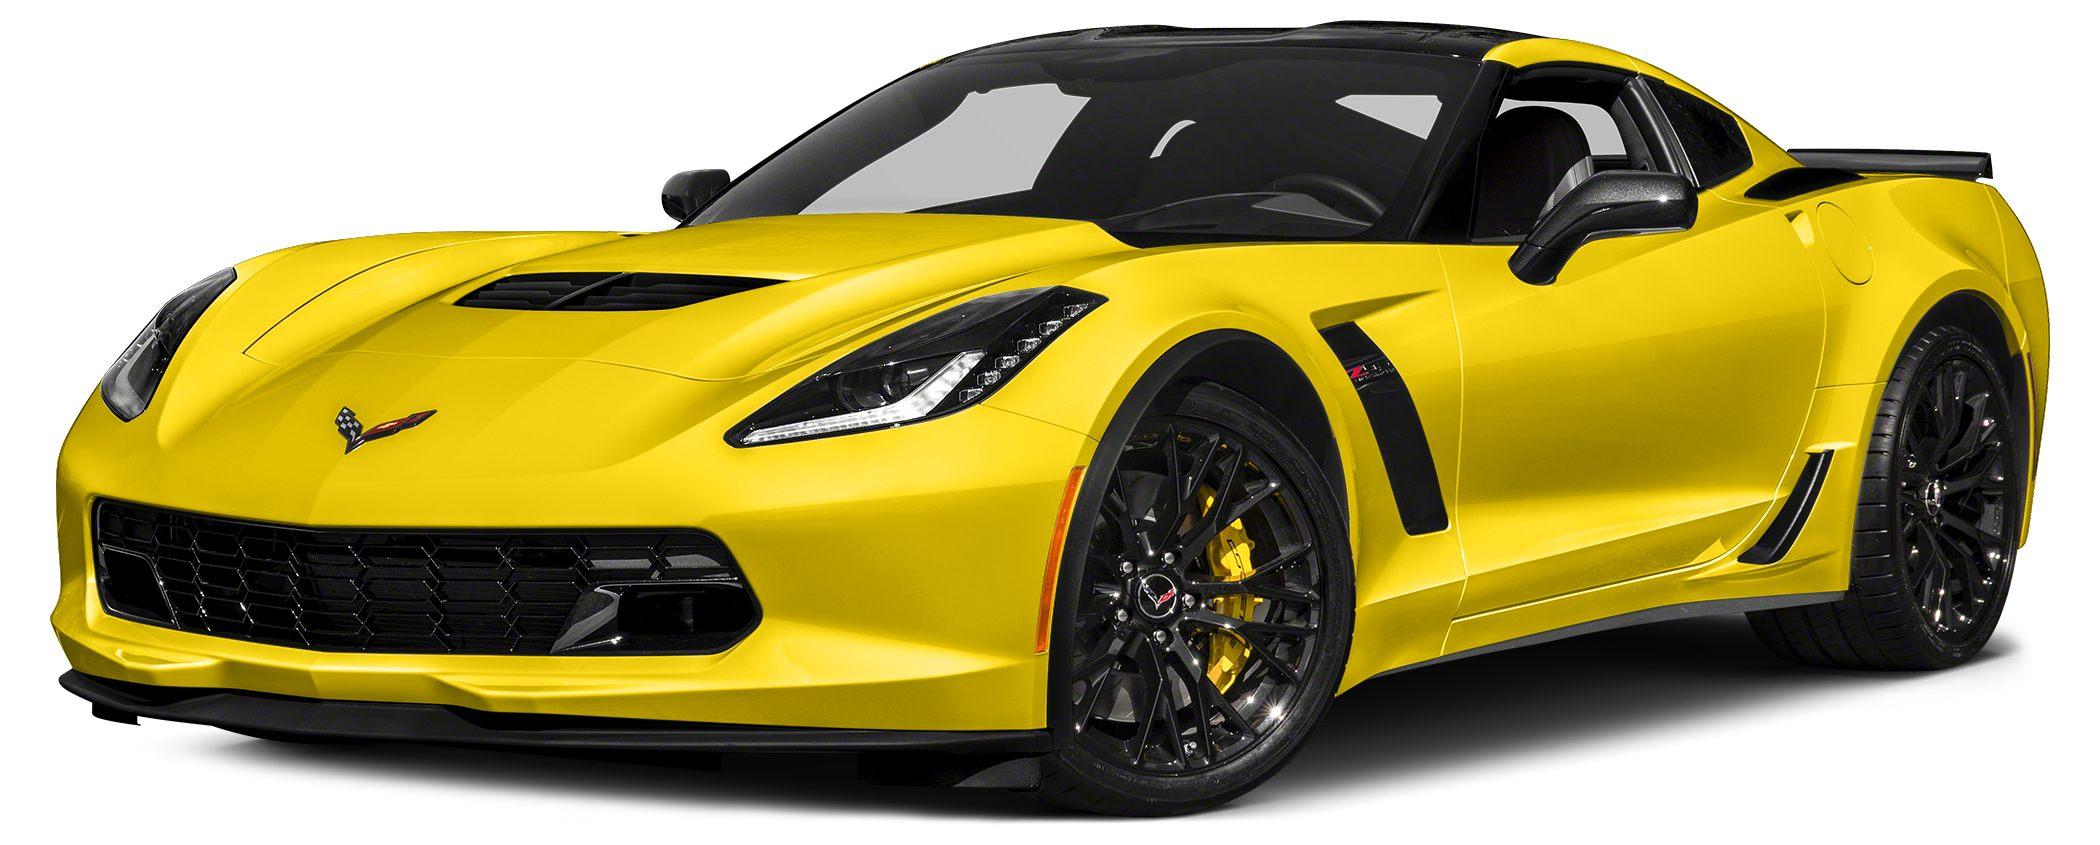 2016 Chevrolet Corvette Z06 Miles 3Color Racing Yellow Stock 612998 VIN 1G1YU2D64G5612998